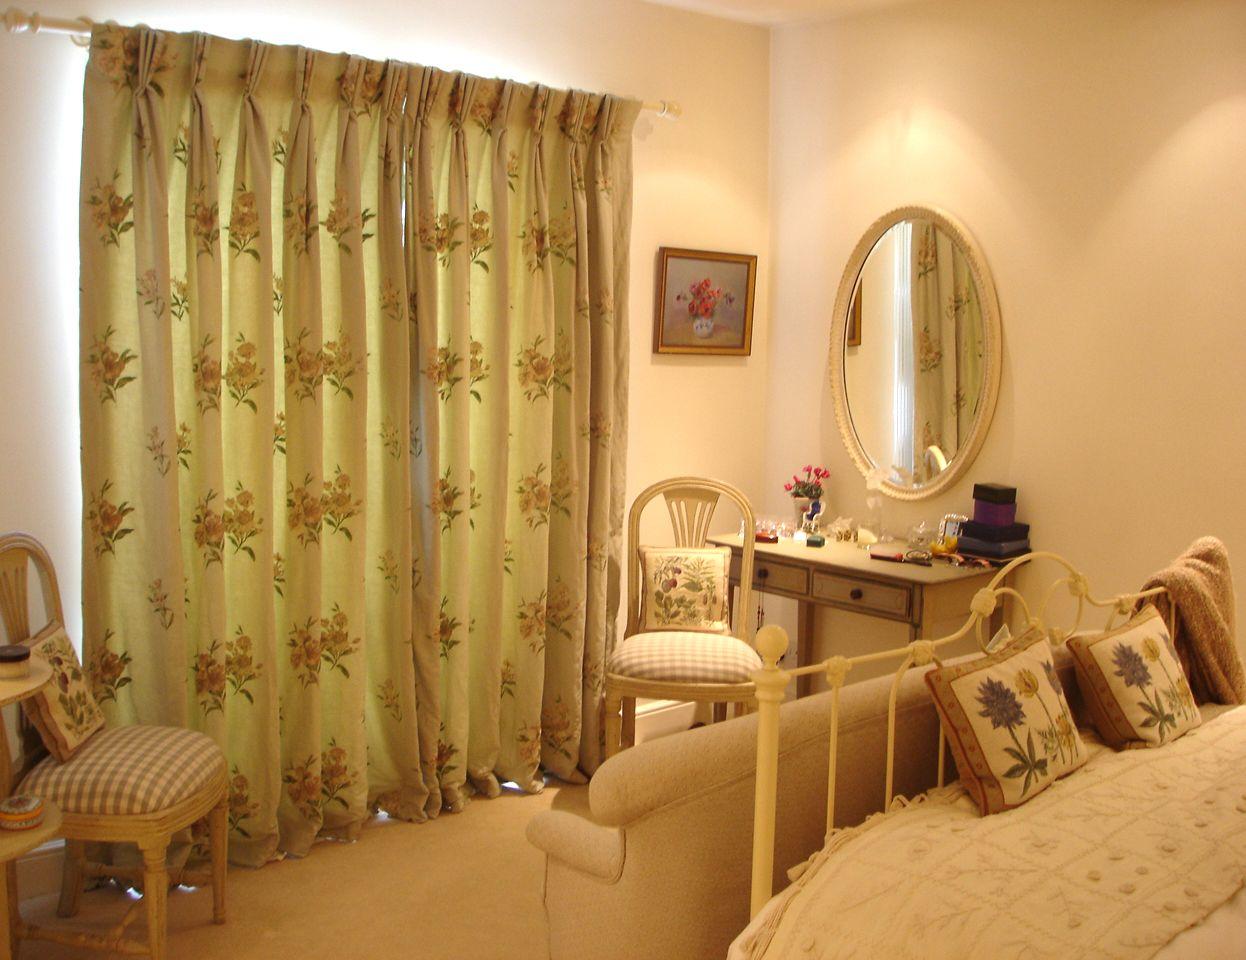 Bedroom Window Curtains | ... Bedroom Curtains: Beautiful Bedroom ...